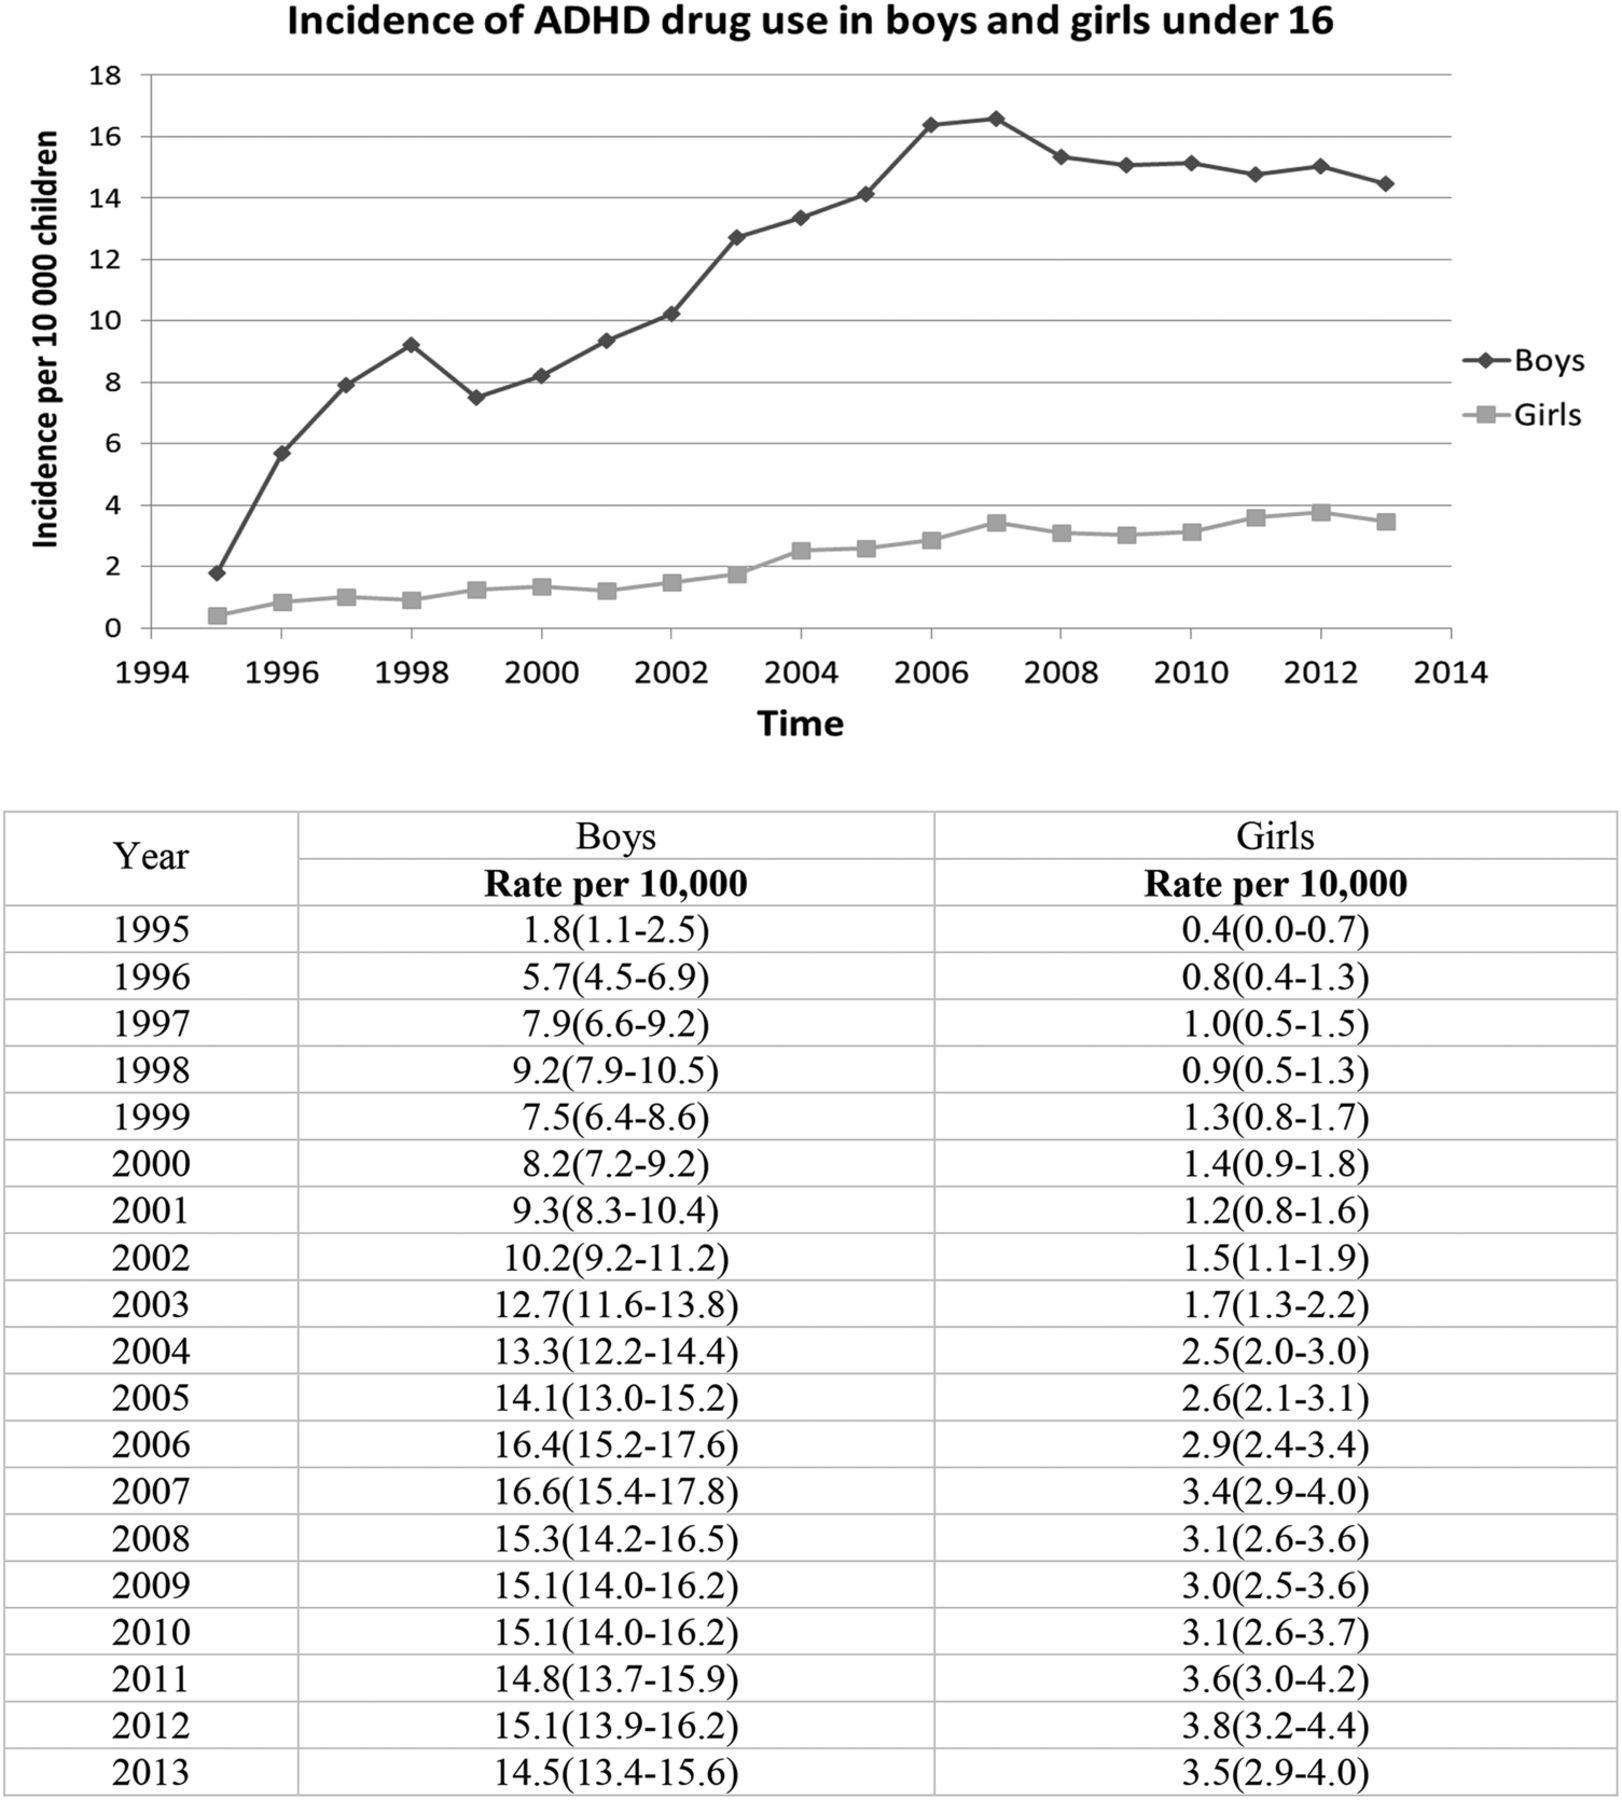 Non Prescription Use Of Ritalin Linked >> Latest Trends In Adhd Drug Prescribing Patterns In Children In The